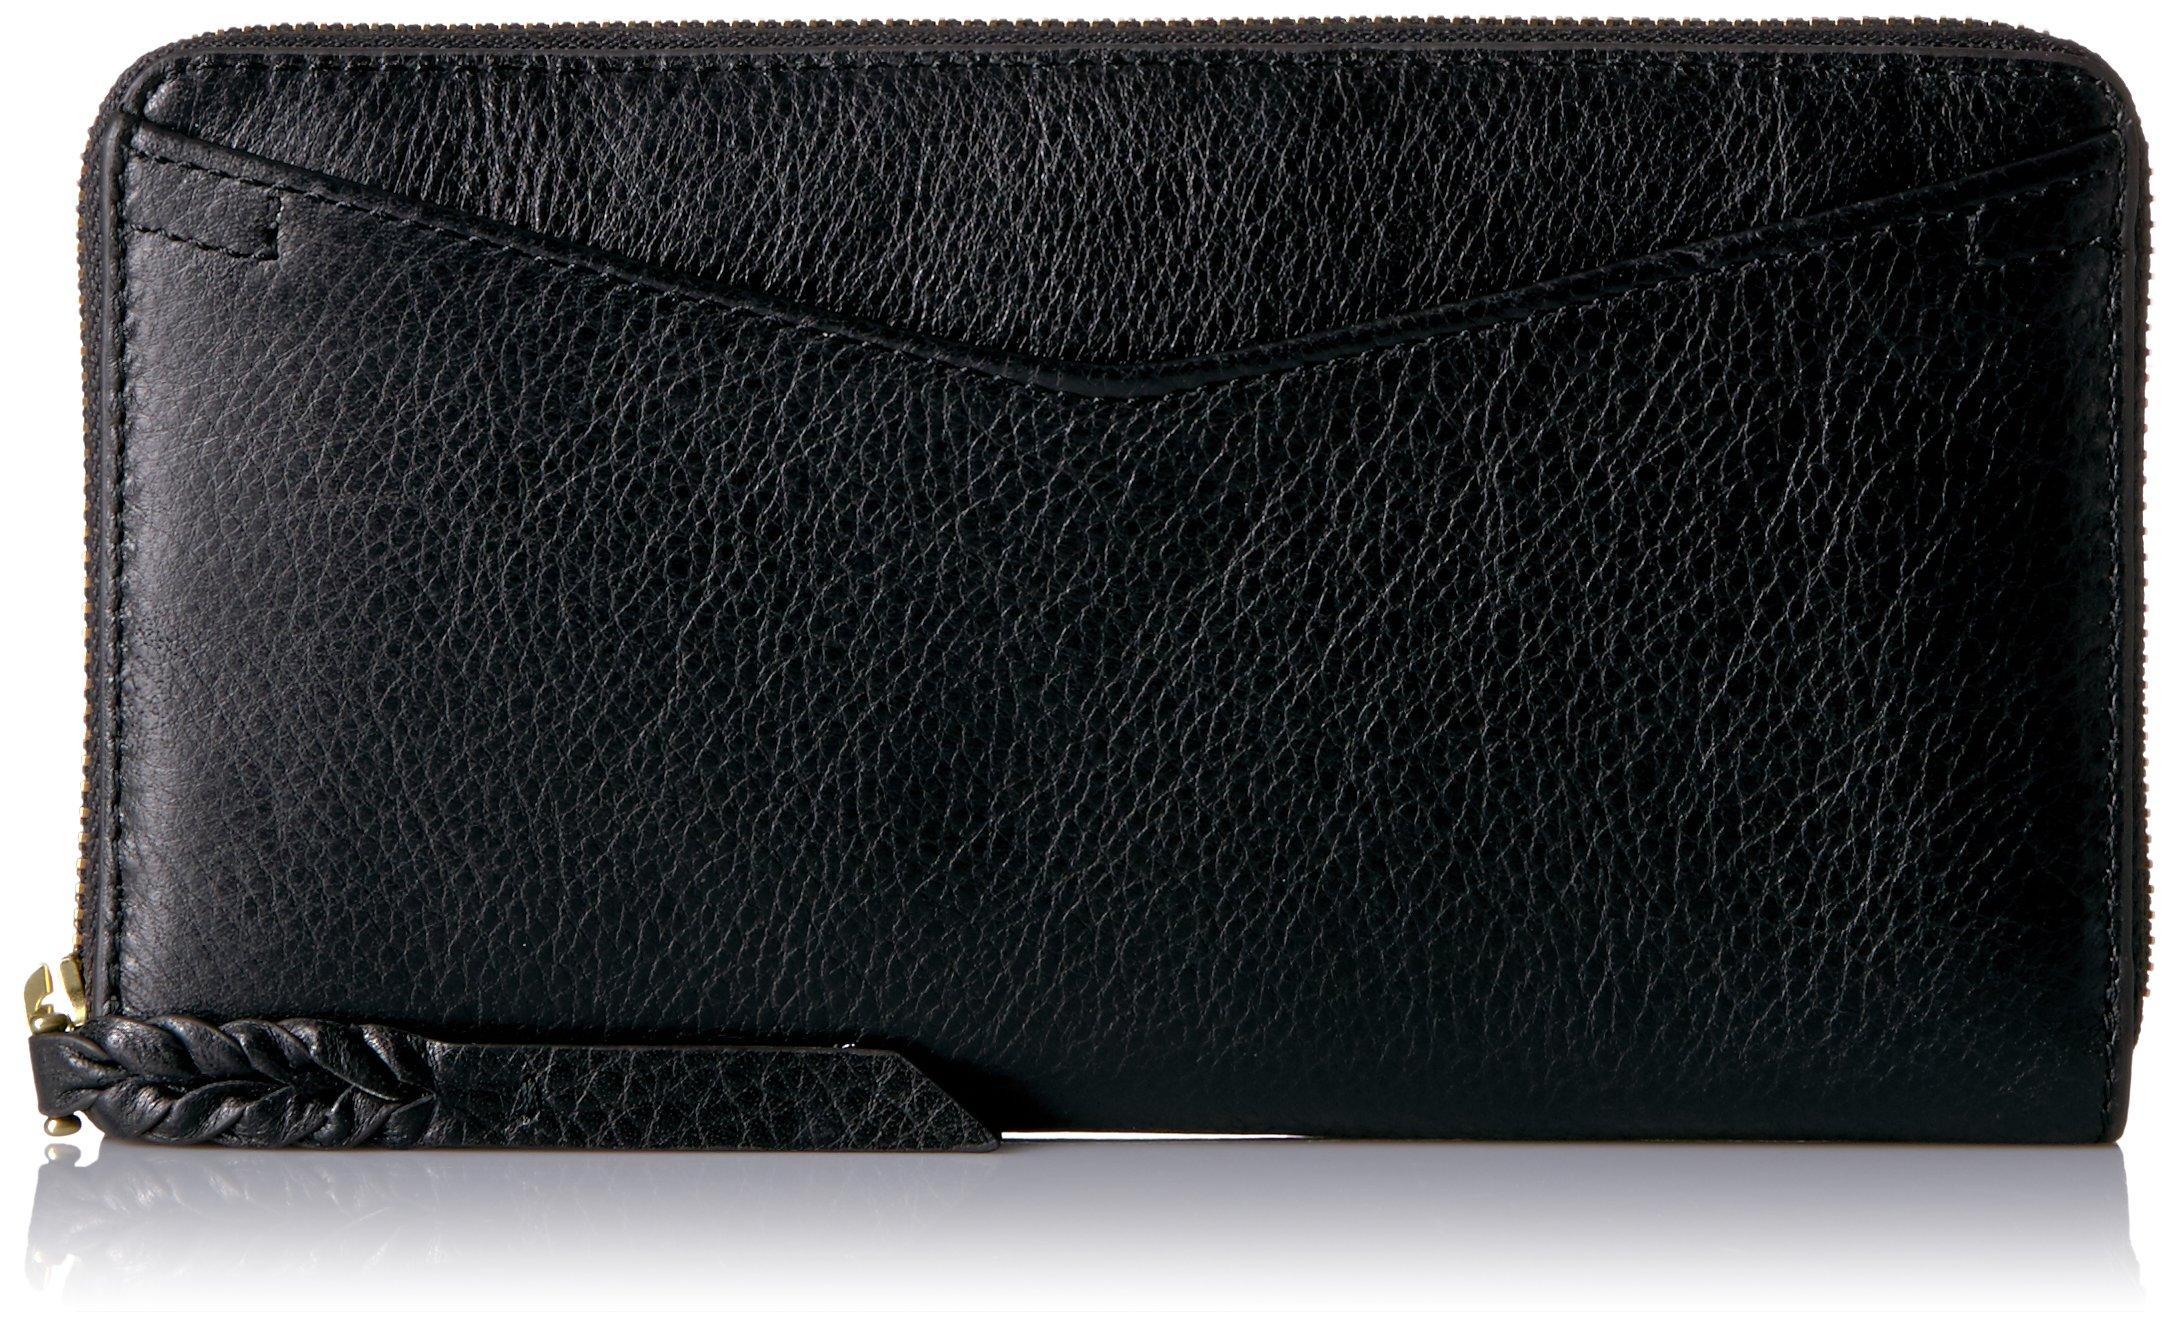 Caroline Rfid Zip Wallet - Black Wallet, Black, One Size by Fossil